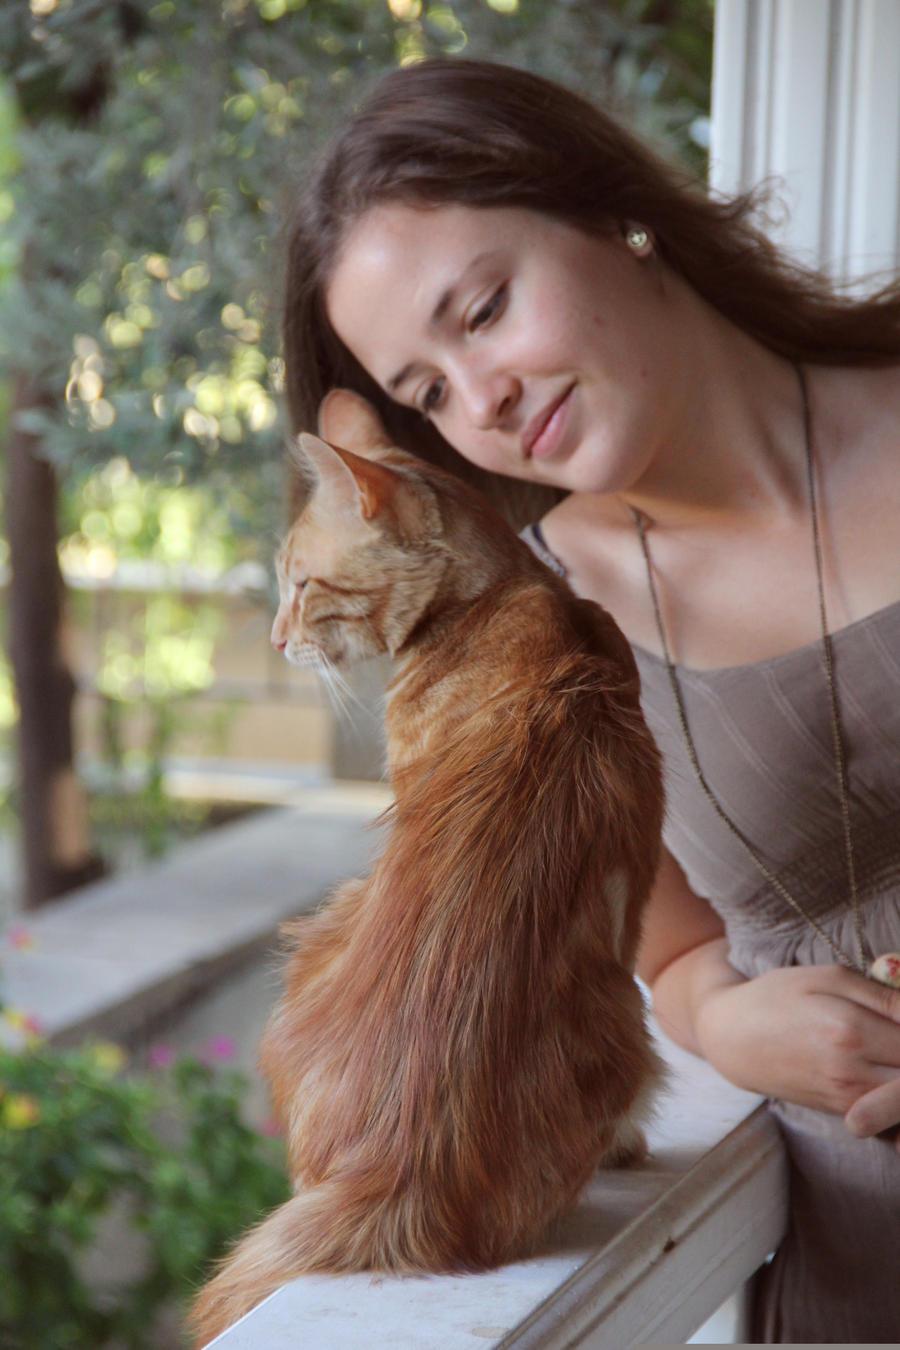 kitty love by yiimisekiz